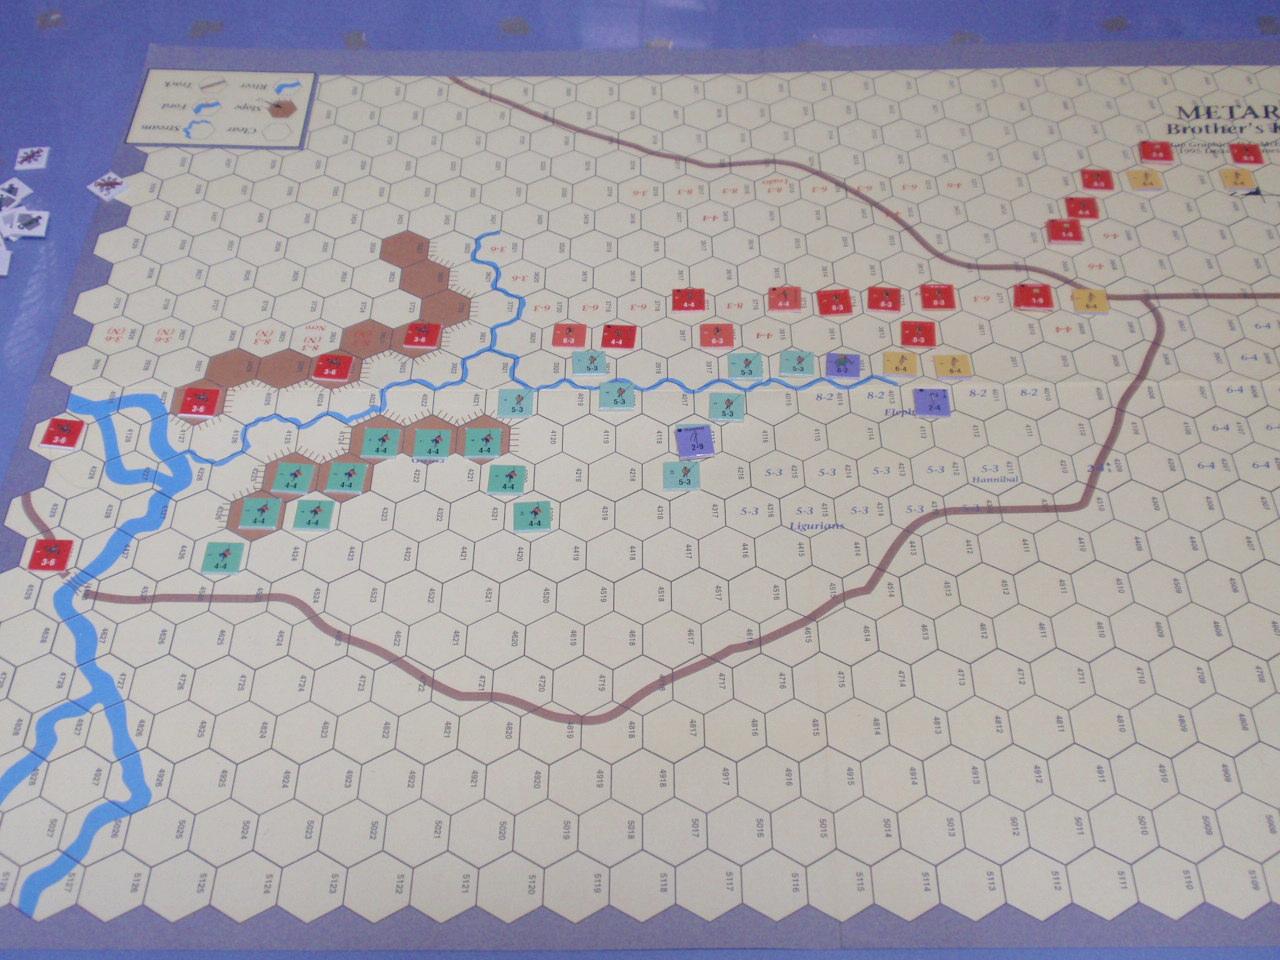 DG「Battles of the Ancient World」シリーズから「Metauras 207B.C.」をソロプレイ③_b0162202_19425510.jpg